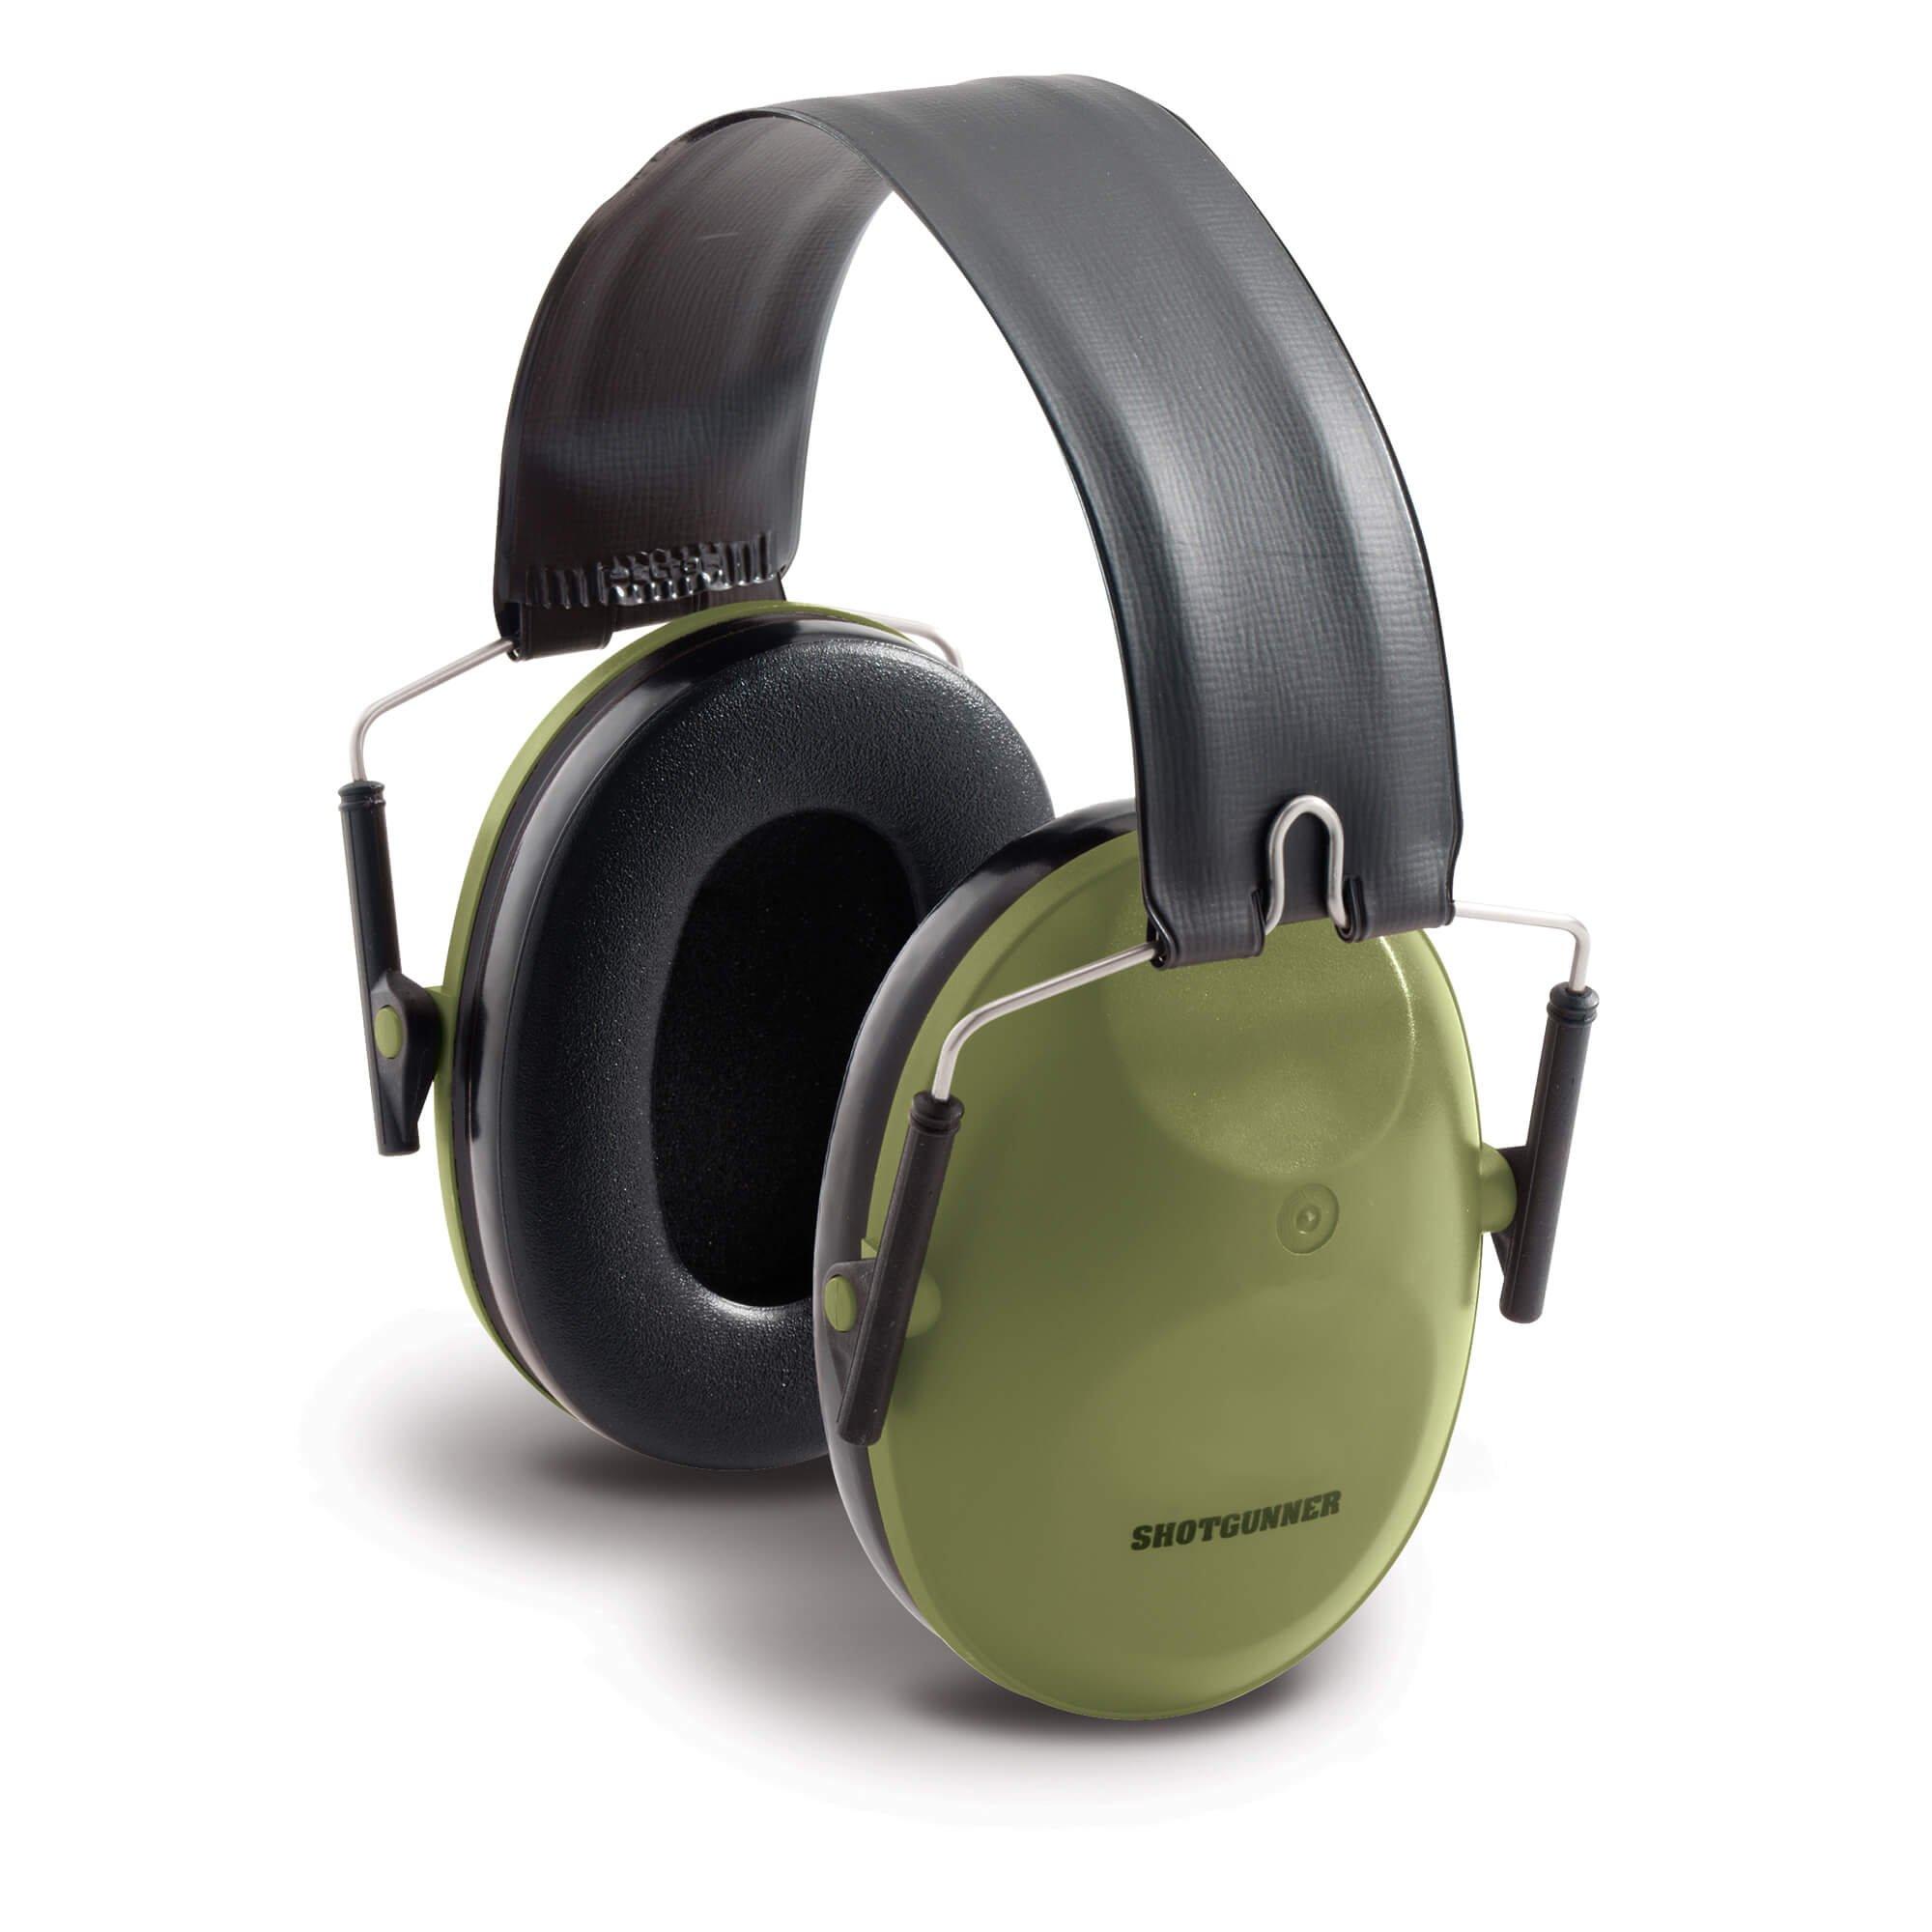 3M Peltor Shotgunner Folding Hearing Protector, Green by 3M